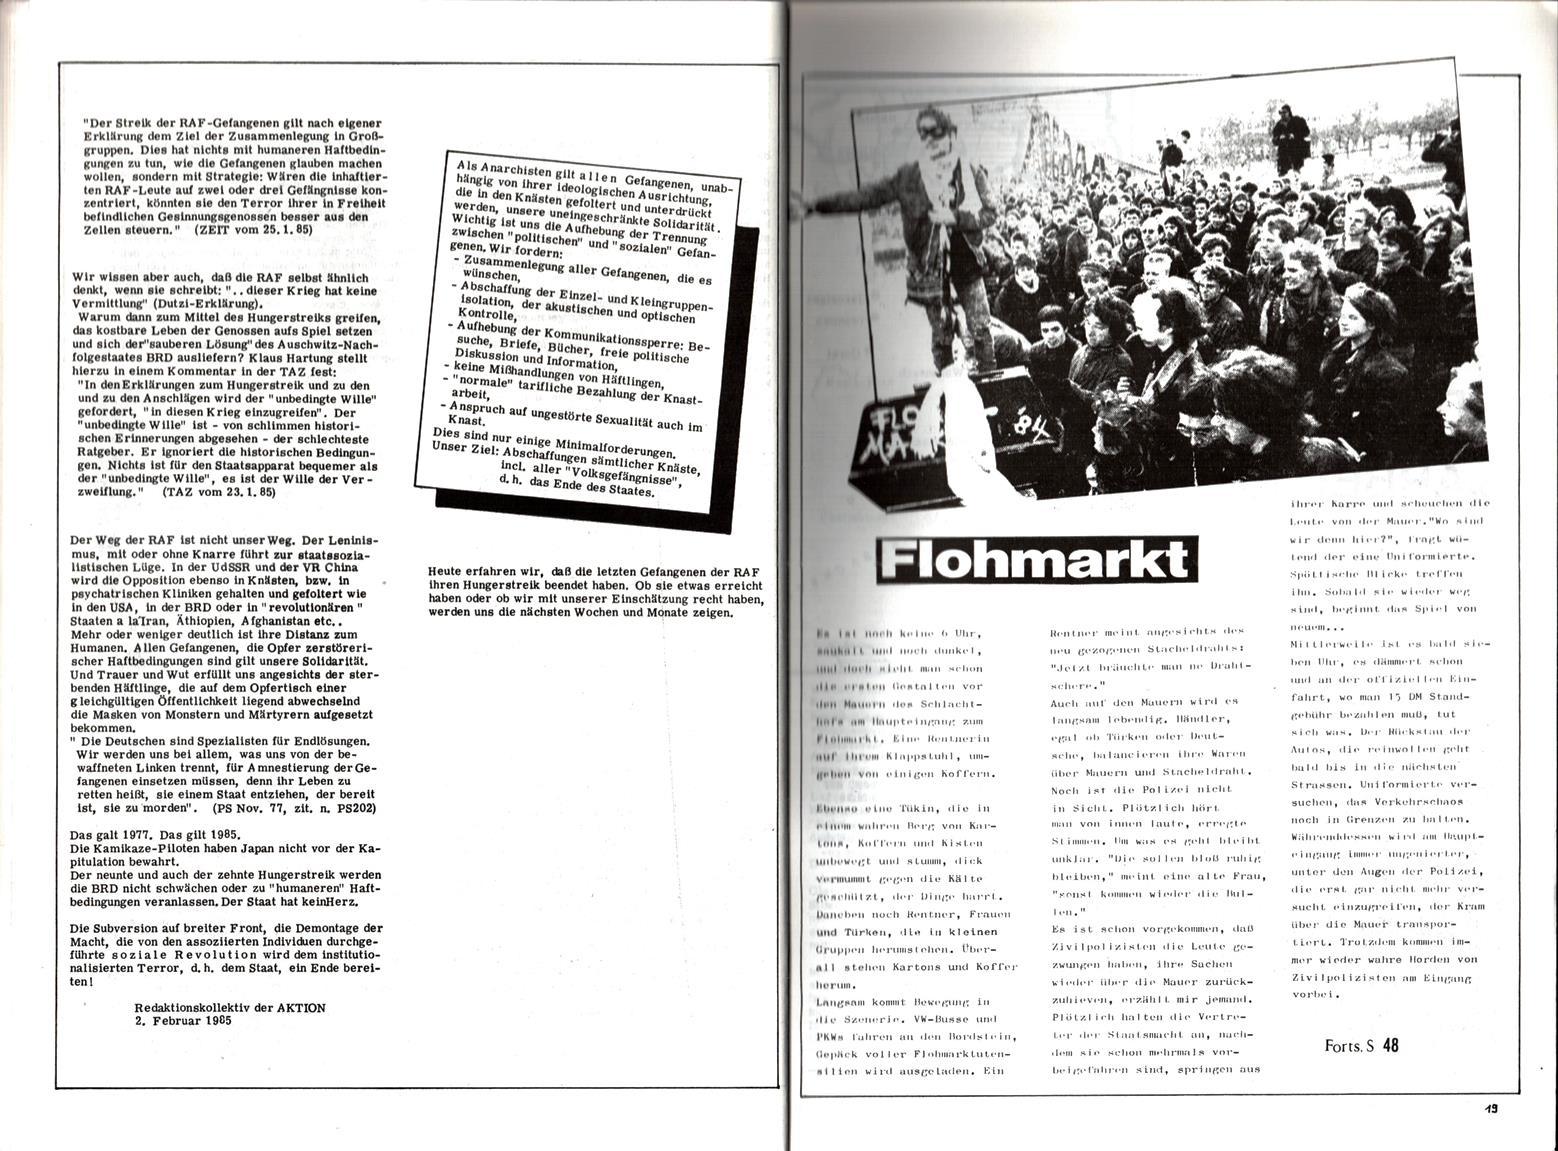 Frankfurt_Aktion_19850200_002_010